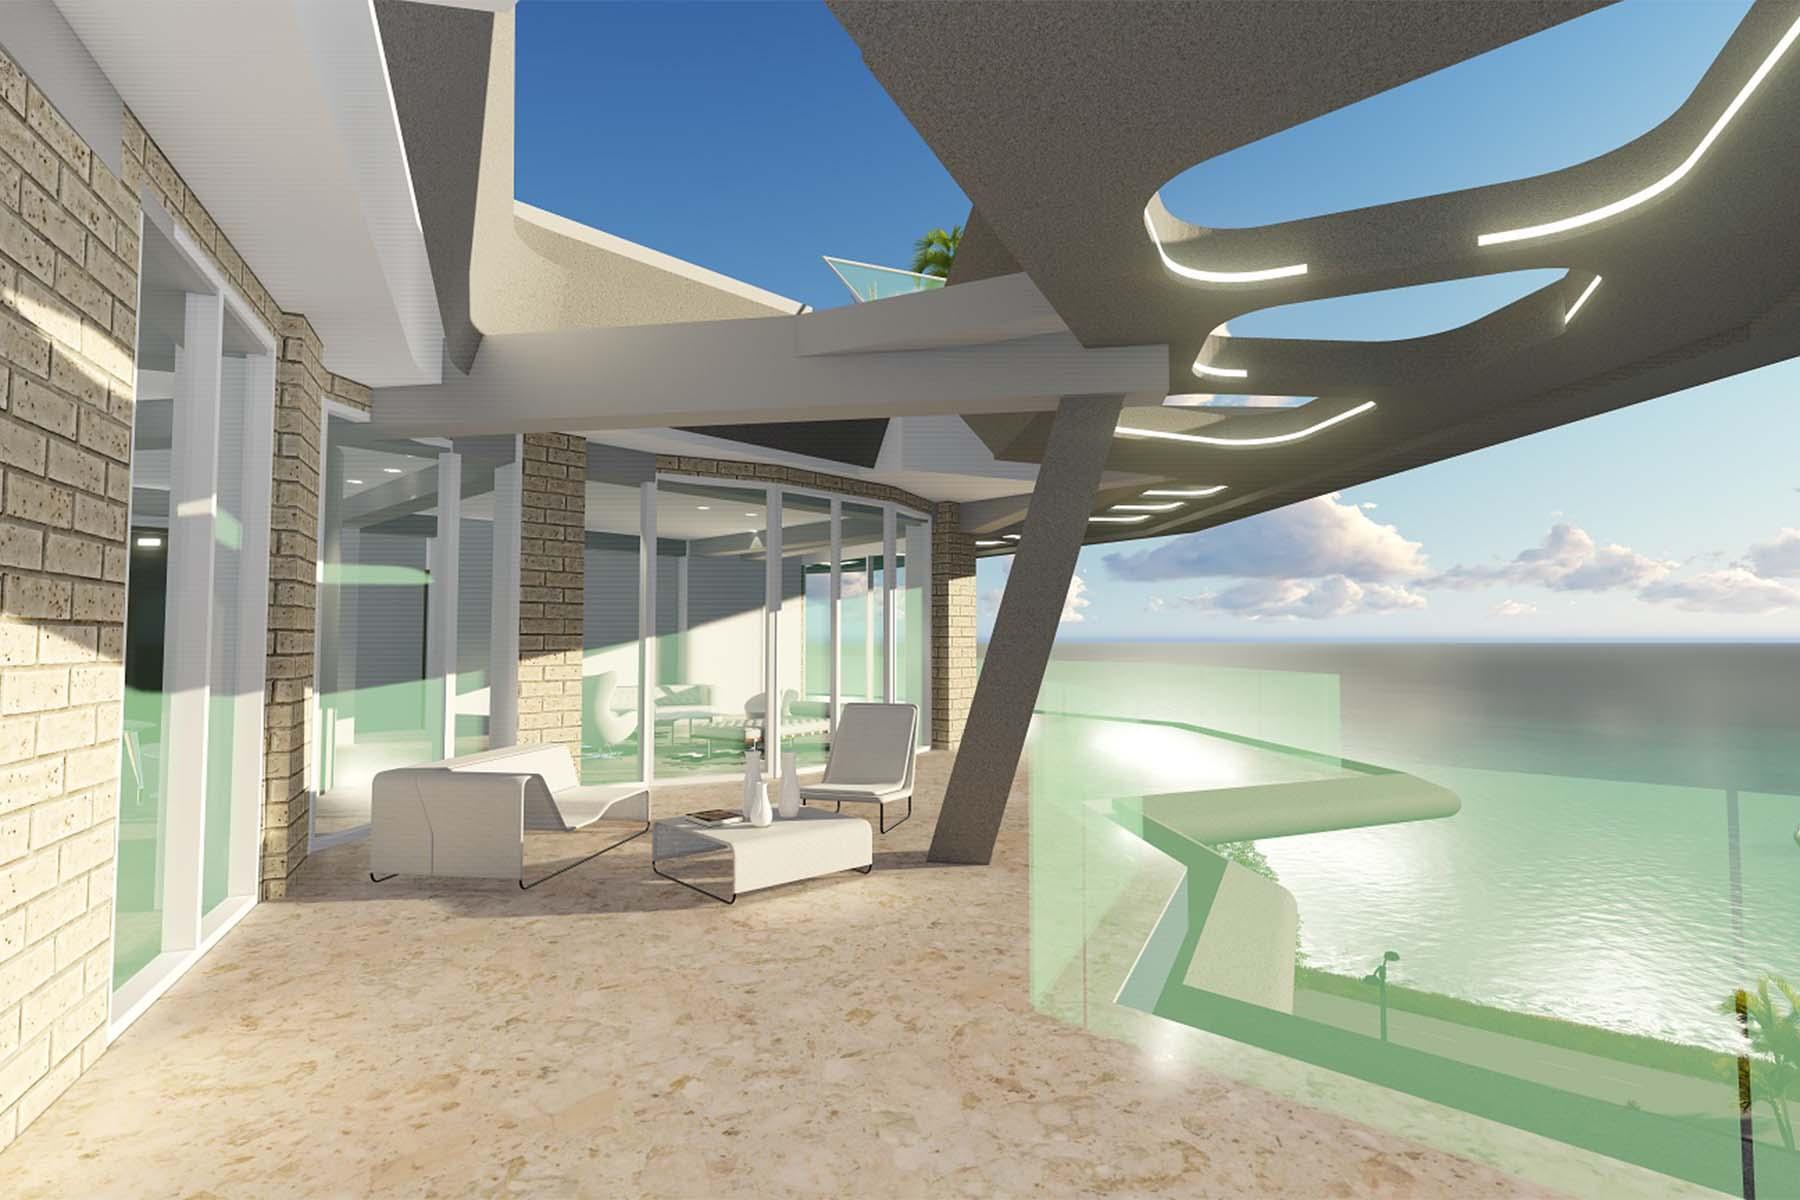 Additional photo for property listing at Coral Shell Penthouse Oranjestad, Aruba Aruba